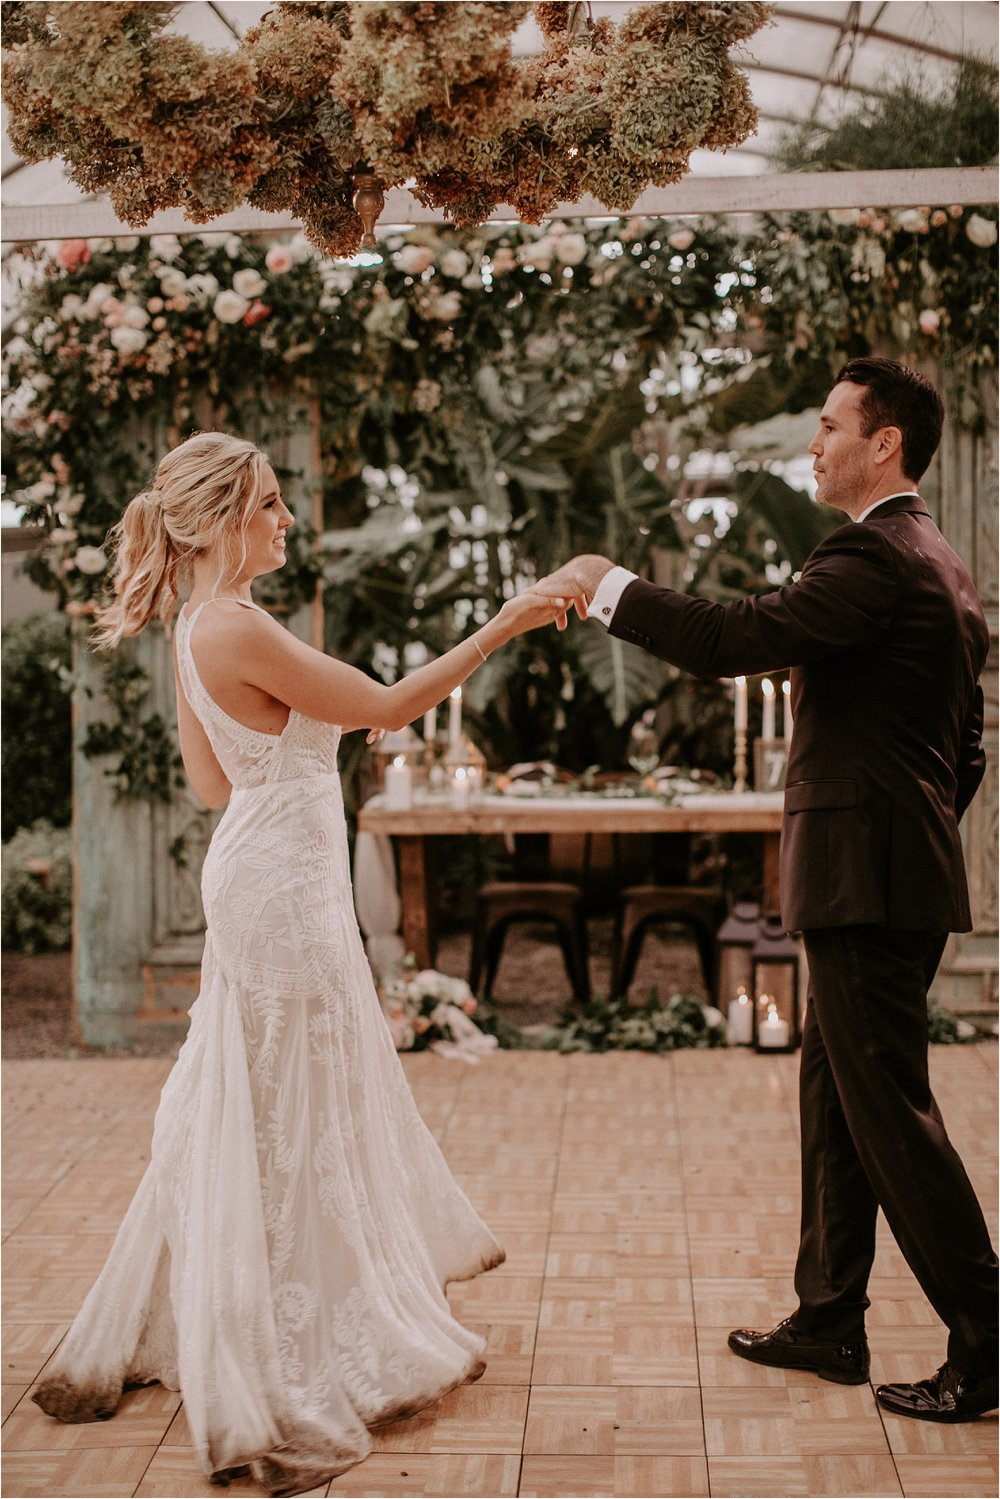 Sarah_Brookhart_Hortulus_Farm_Garden_and_Nursey_Wedding_Photographer_0067.jpg